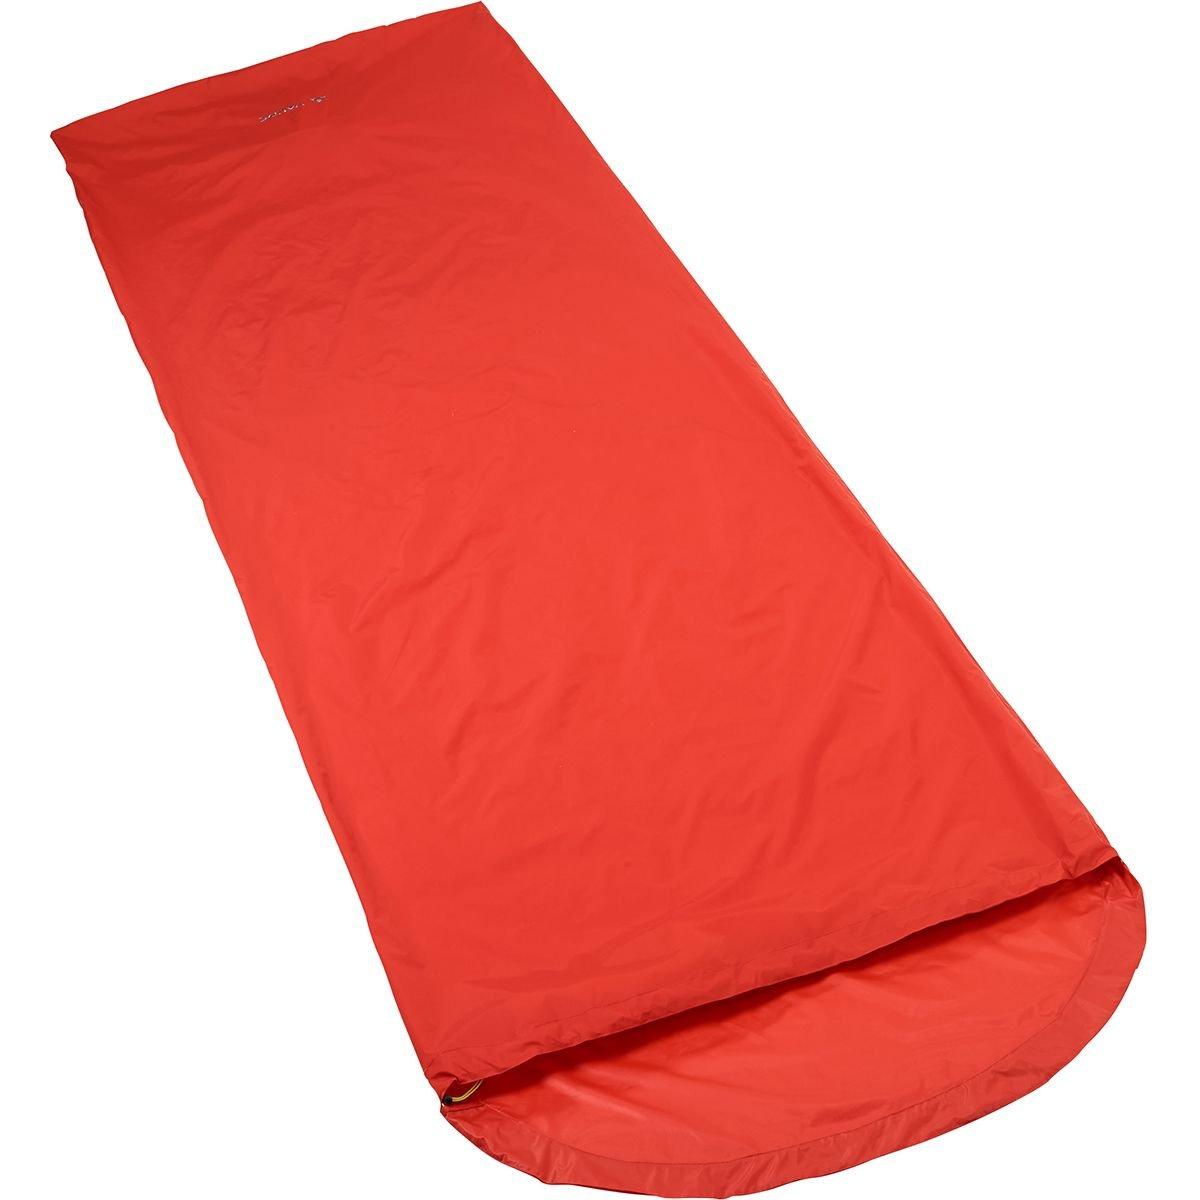 VAUDE Biwak II.2 - Saco de vivac Color Glowing Red, Talla One Size VADE5 #VAUDE 125062810000